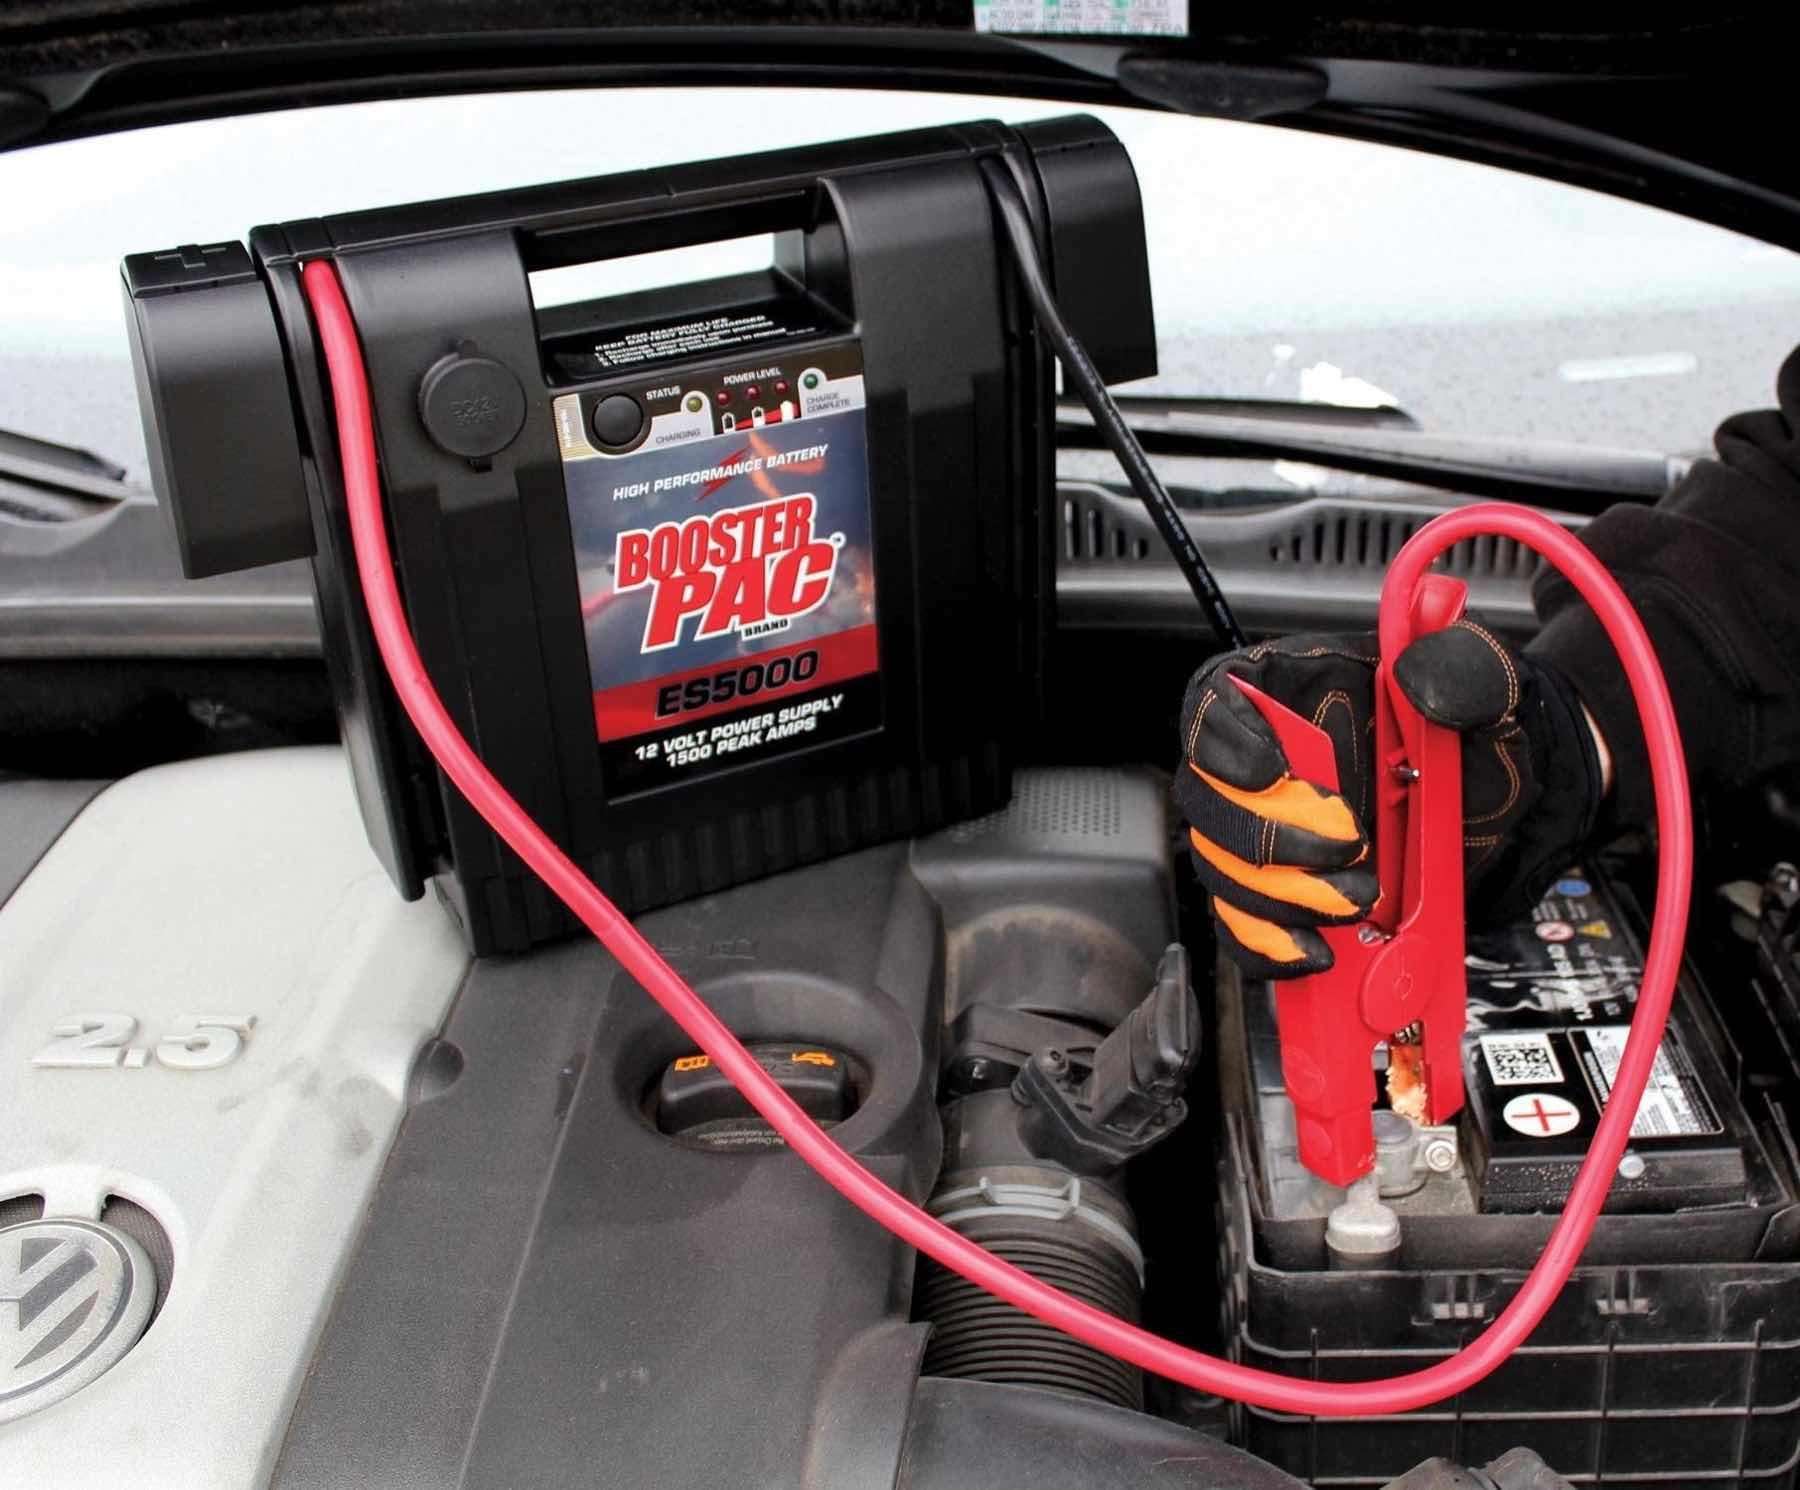 clore-booster-pac-es5000-portable-jump-starter-2